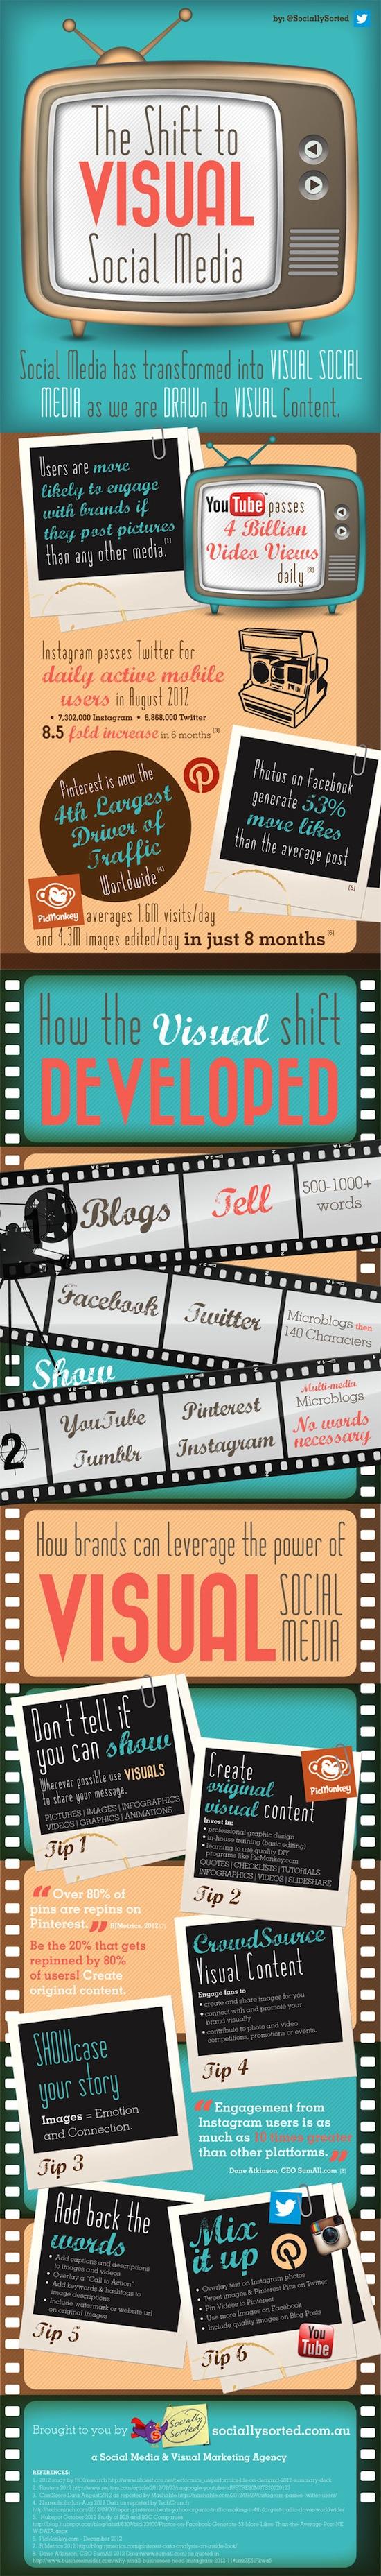 visuels médias sociaux hubspot